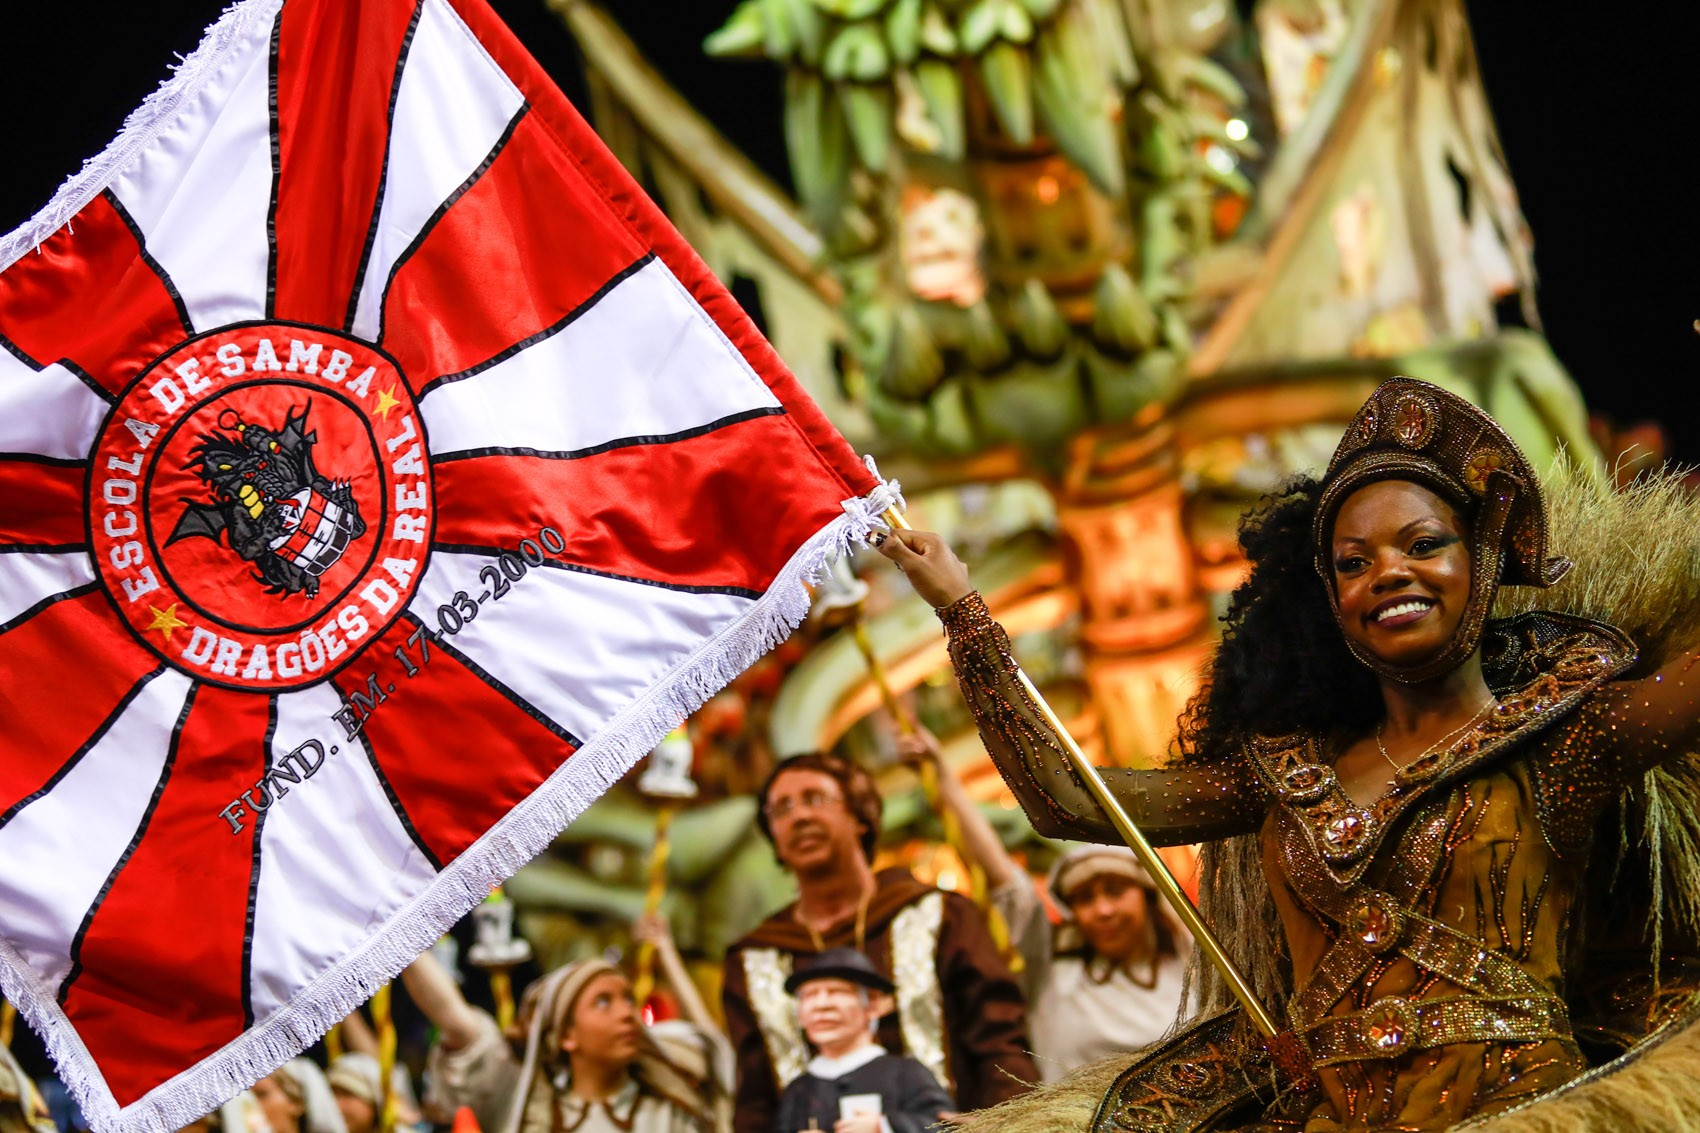 Inspirada no clássico 'Asa Branca', Dragões fez desfile vibrante sobre o Nordeste